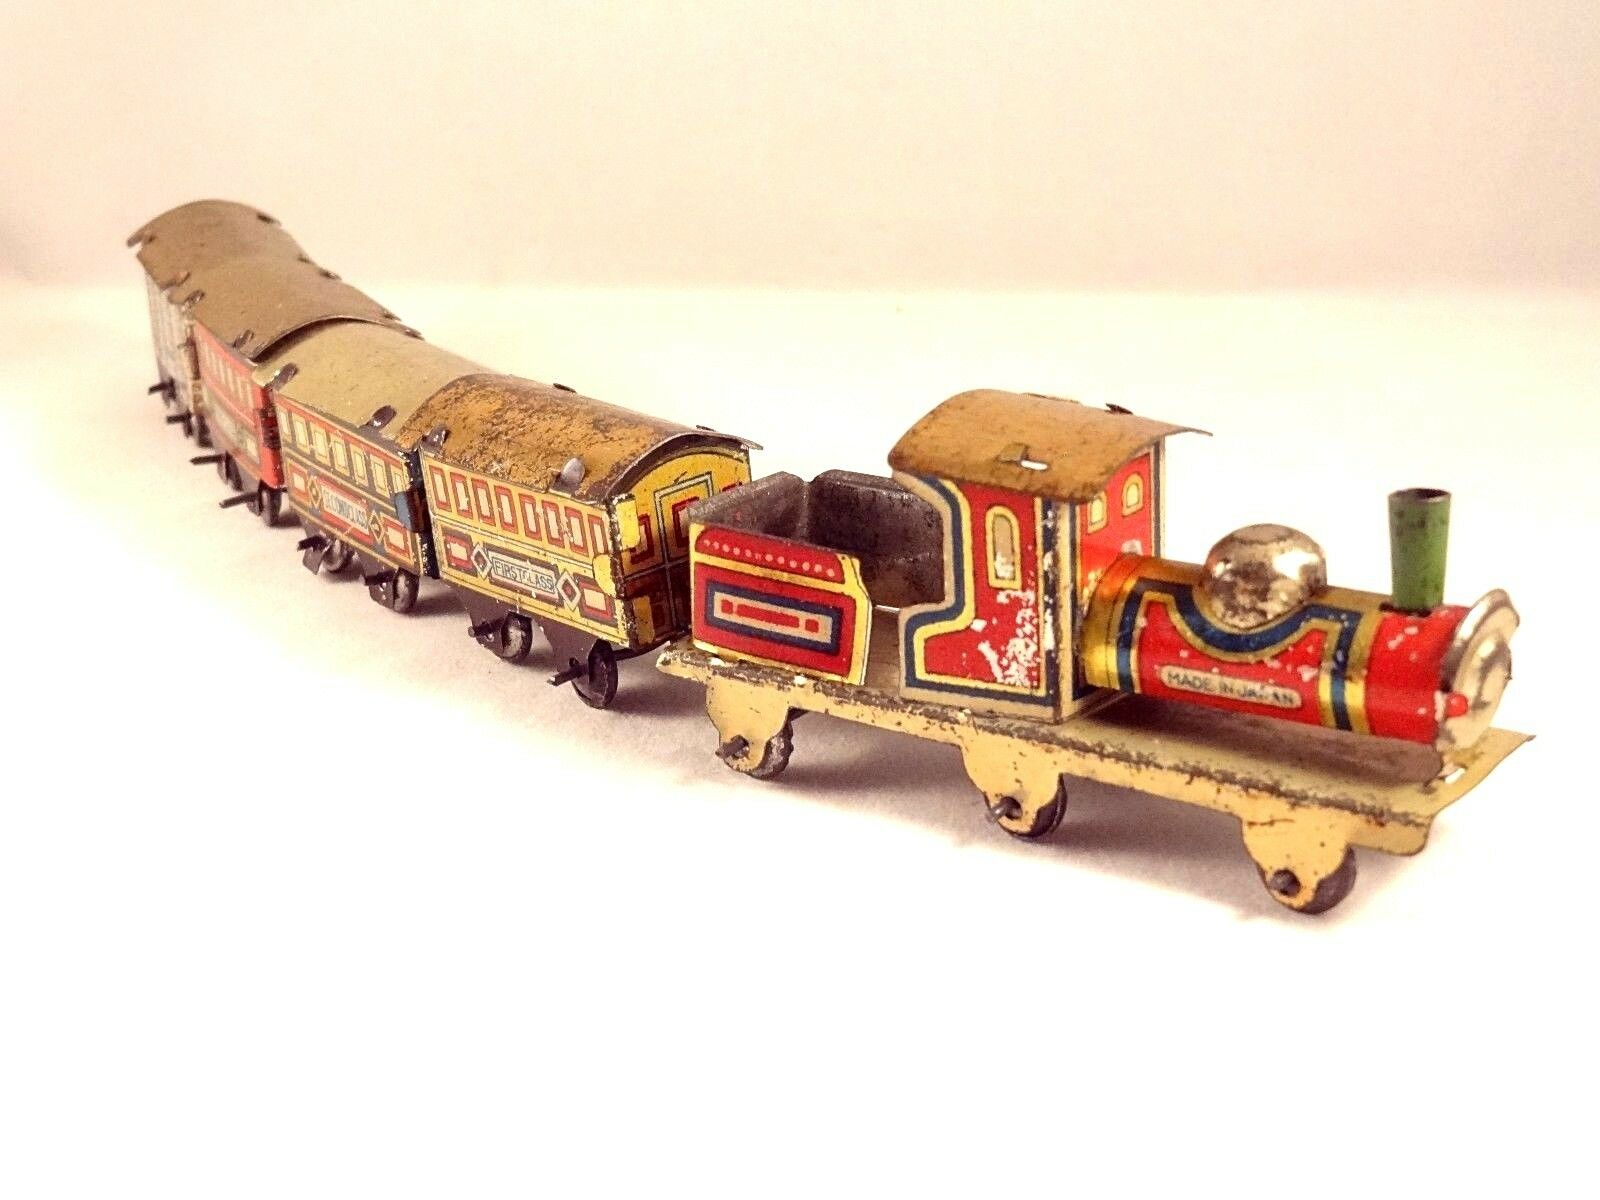 Ancien jouet train locomotive wagon tôle litho penny penny penny toy Japan 1910/20 Superbe aa4758